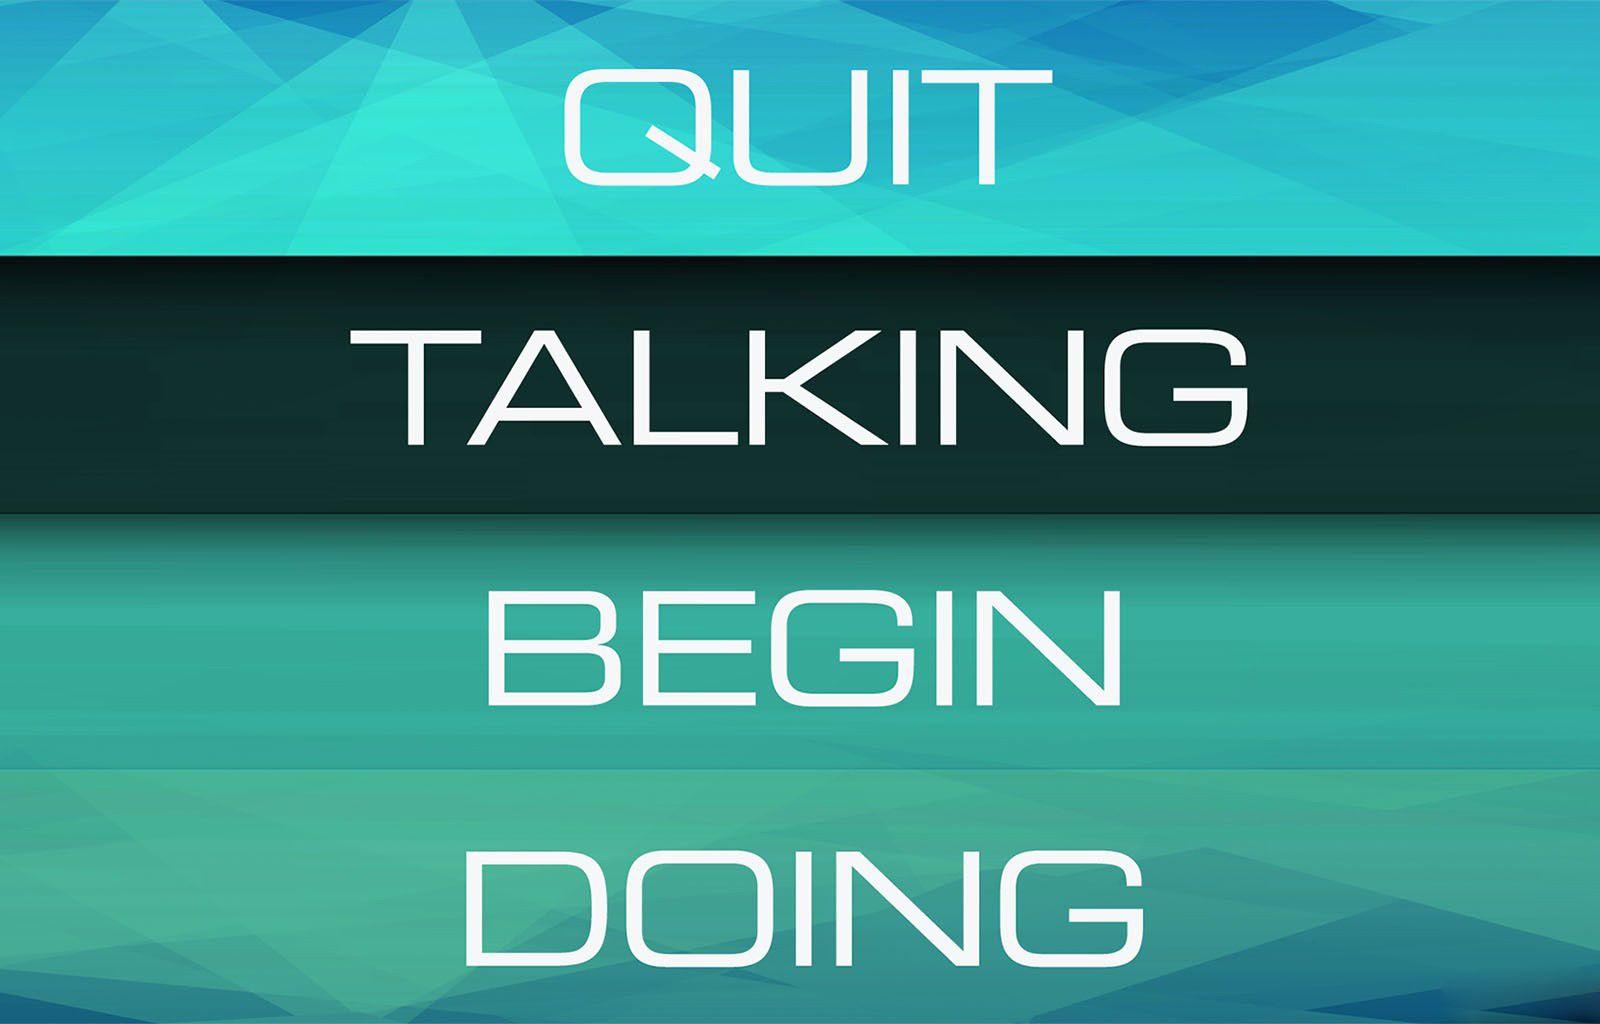 Inspirational Quotes Wallpapers Hd For Desktop Group - Motivational Quotes Wallpapers For Students - HD Wallpaper